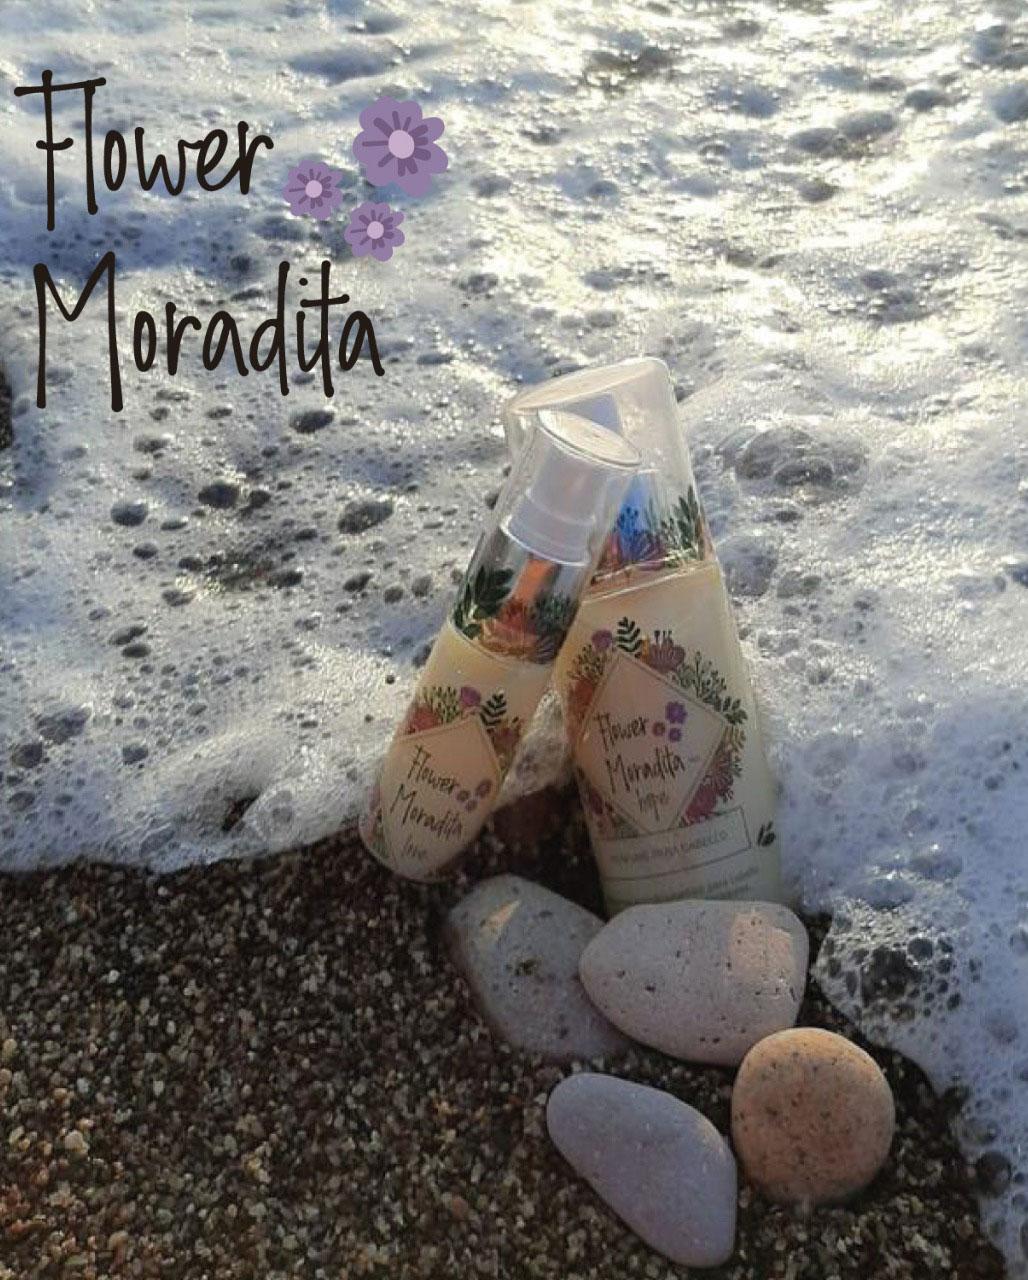 Flower Moradita